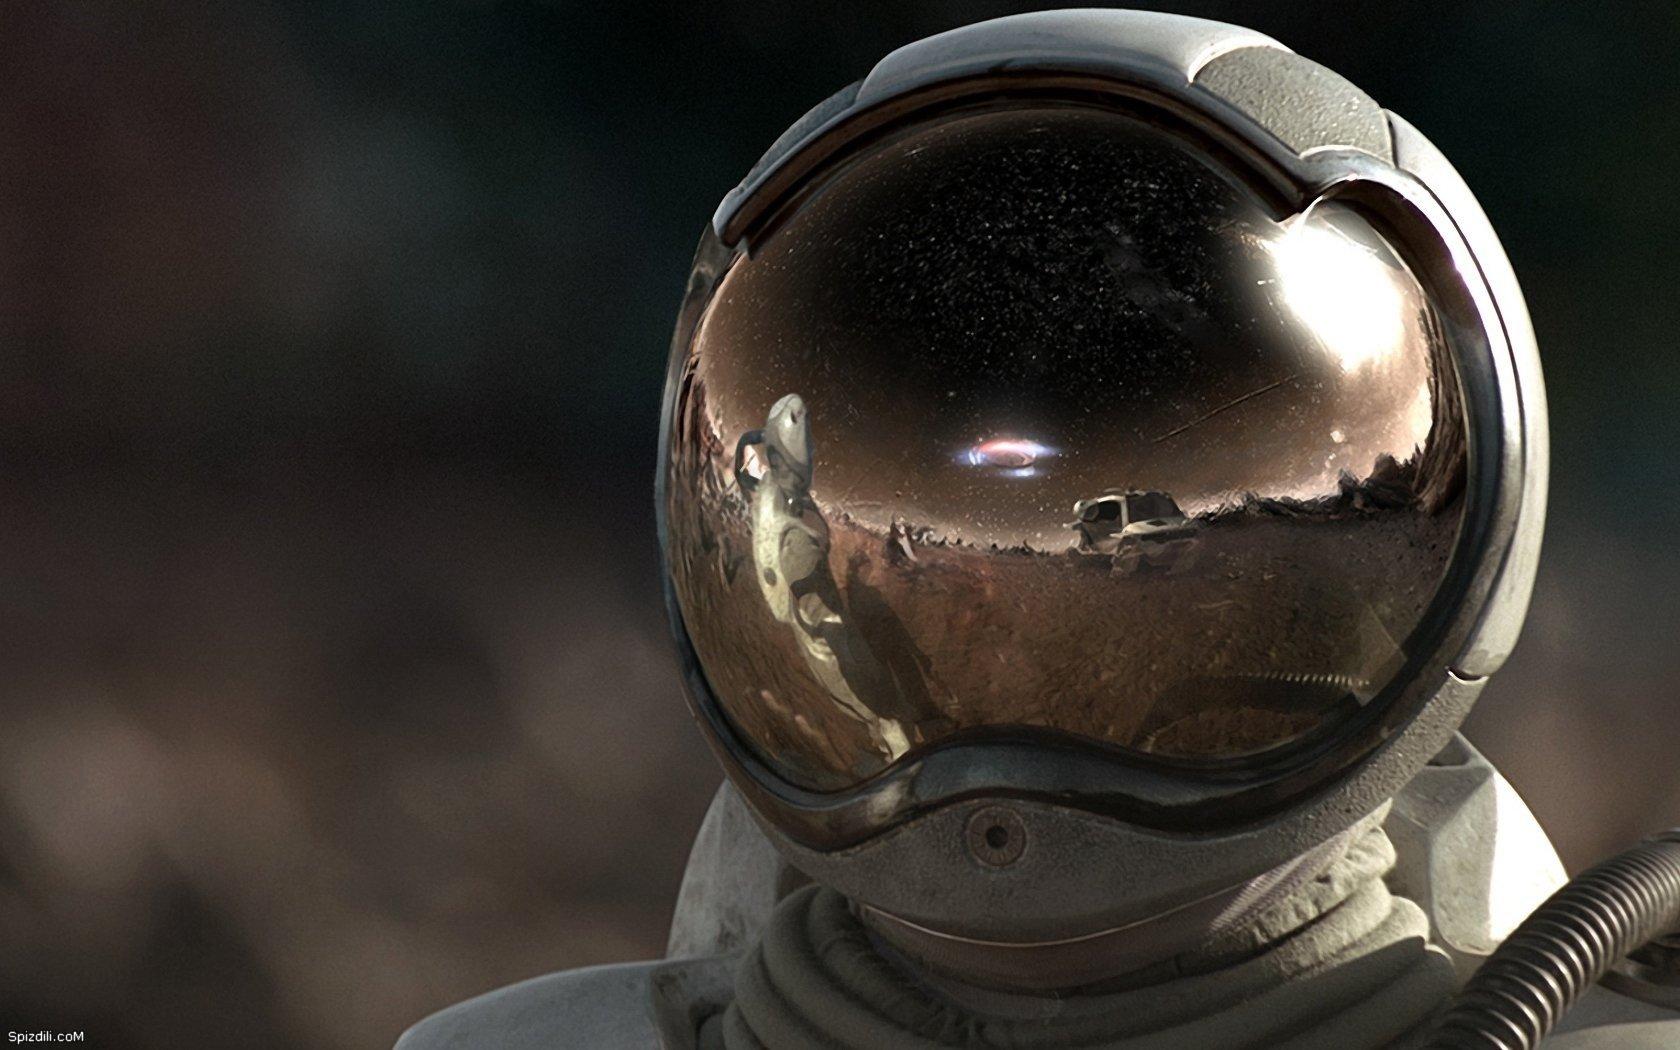 Outer, Space, Helmet, Astronauts, Alien Wallpapers - Space Alien , HD Wallpaper & Backgrounds